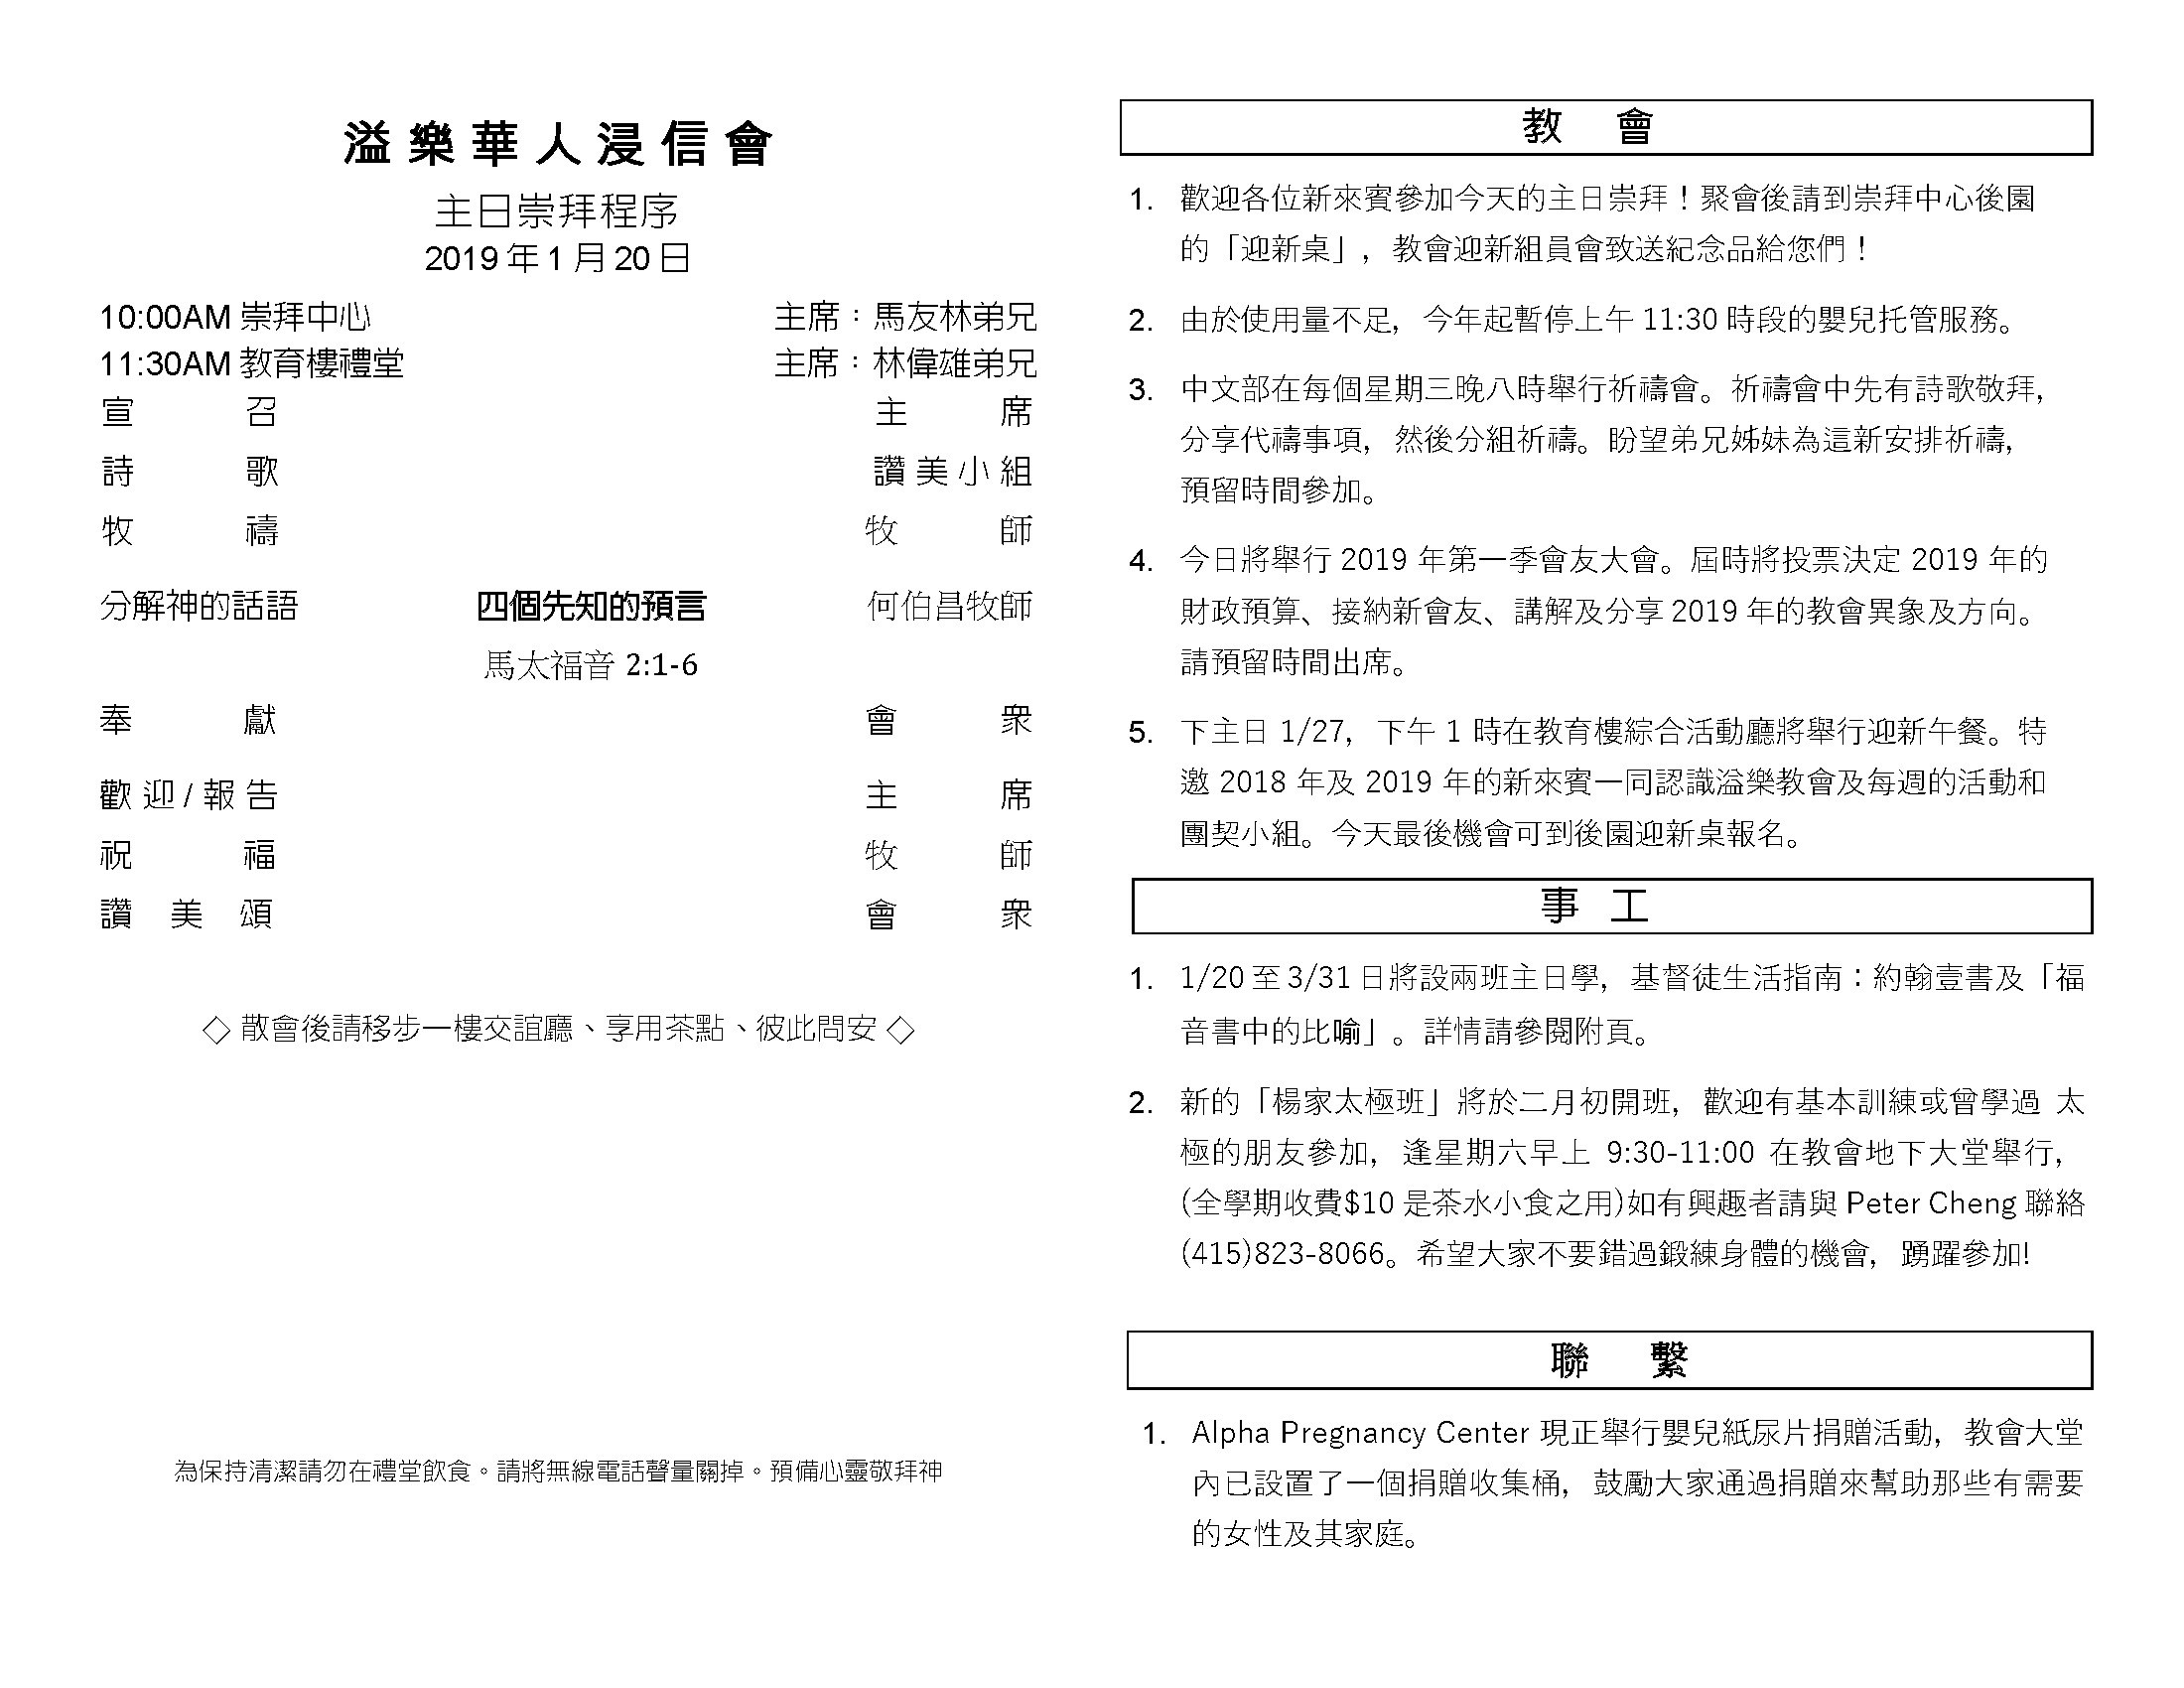 Chinese Bulletin 2019-1-20_Page_2.jpg